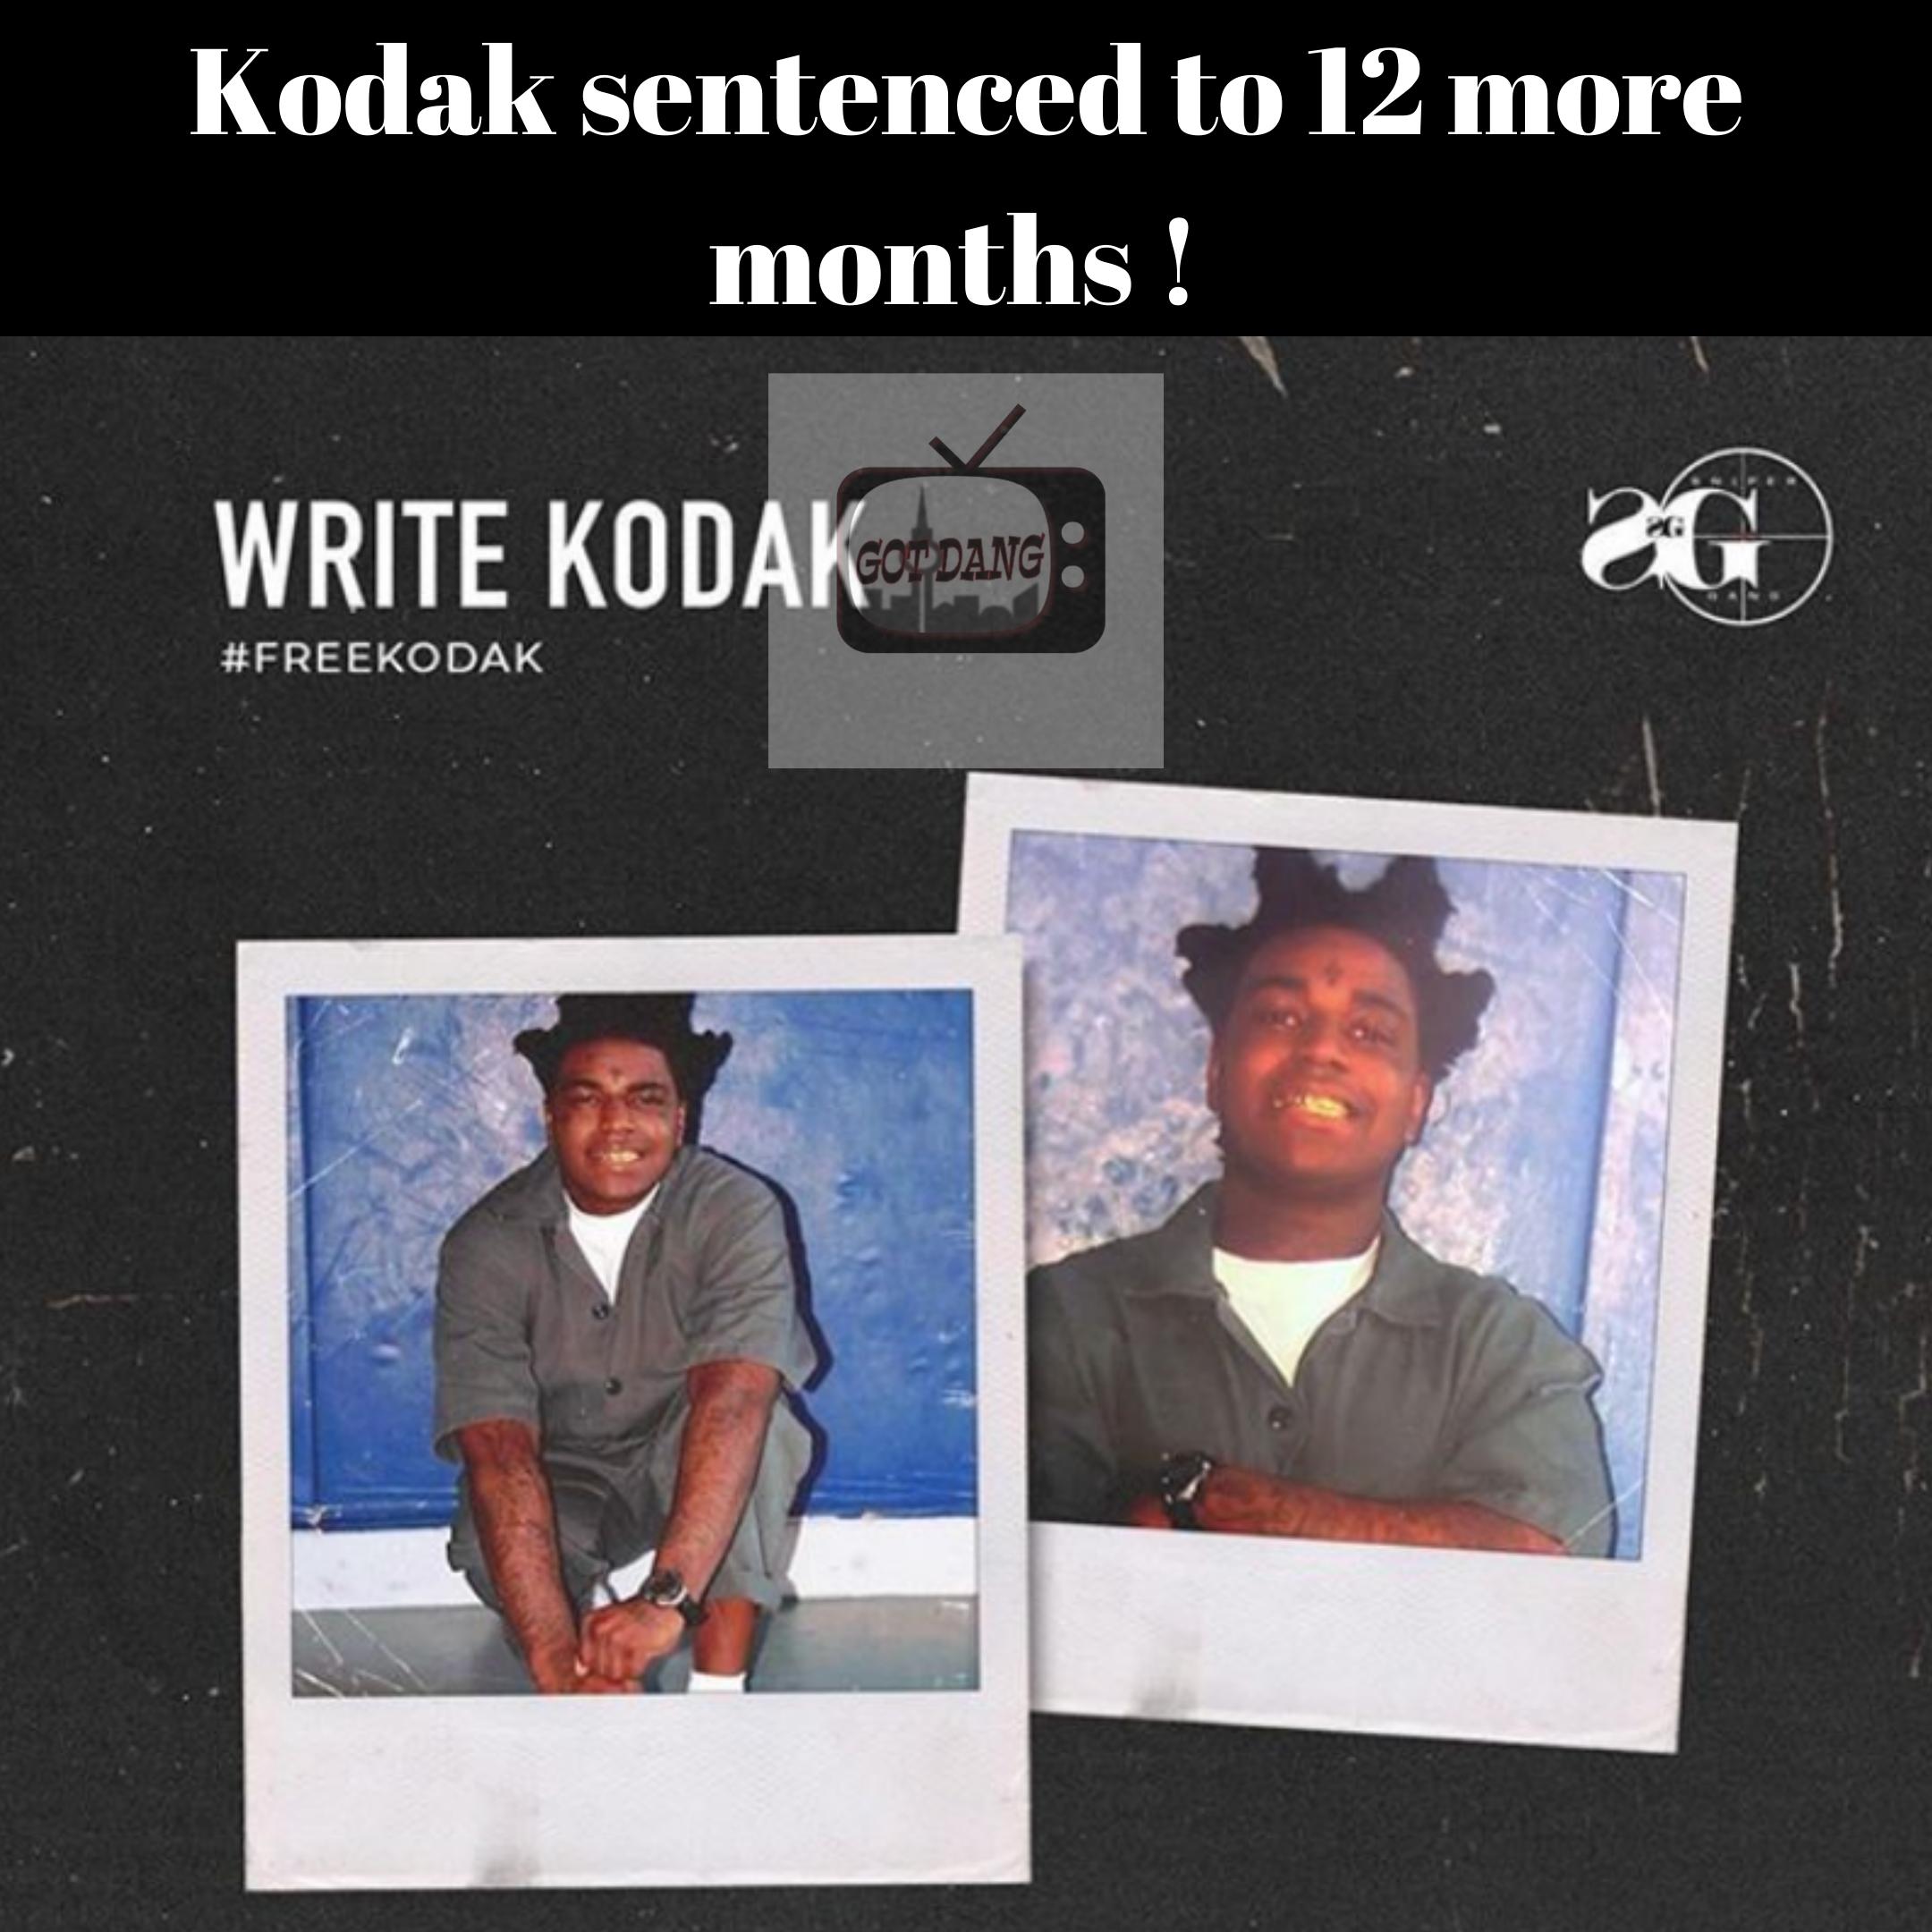 Kodak black sentenced to 12 more months